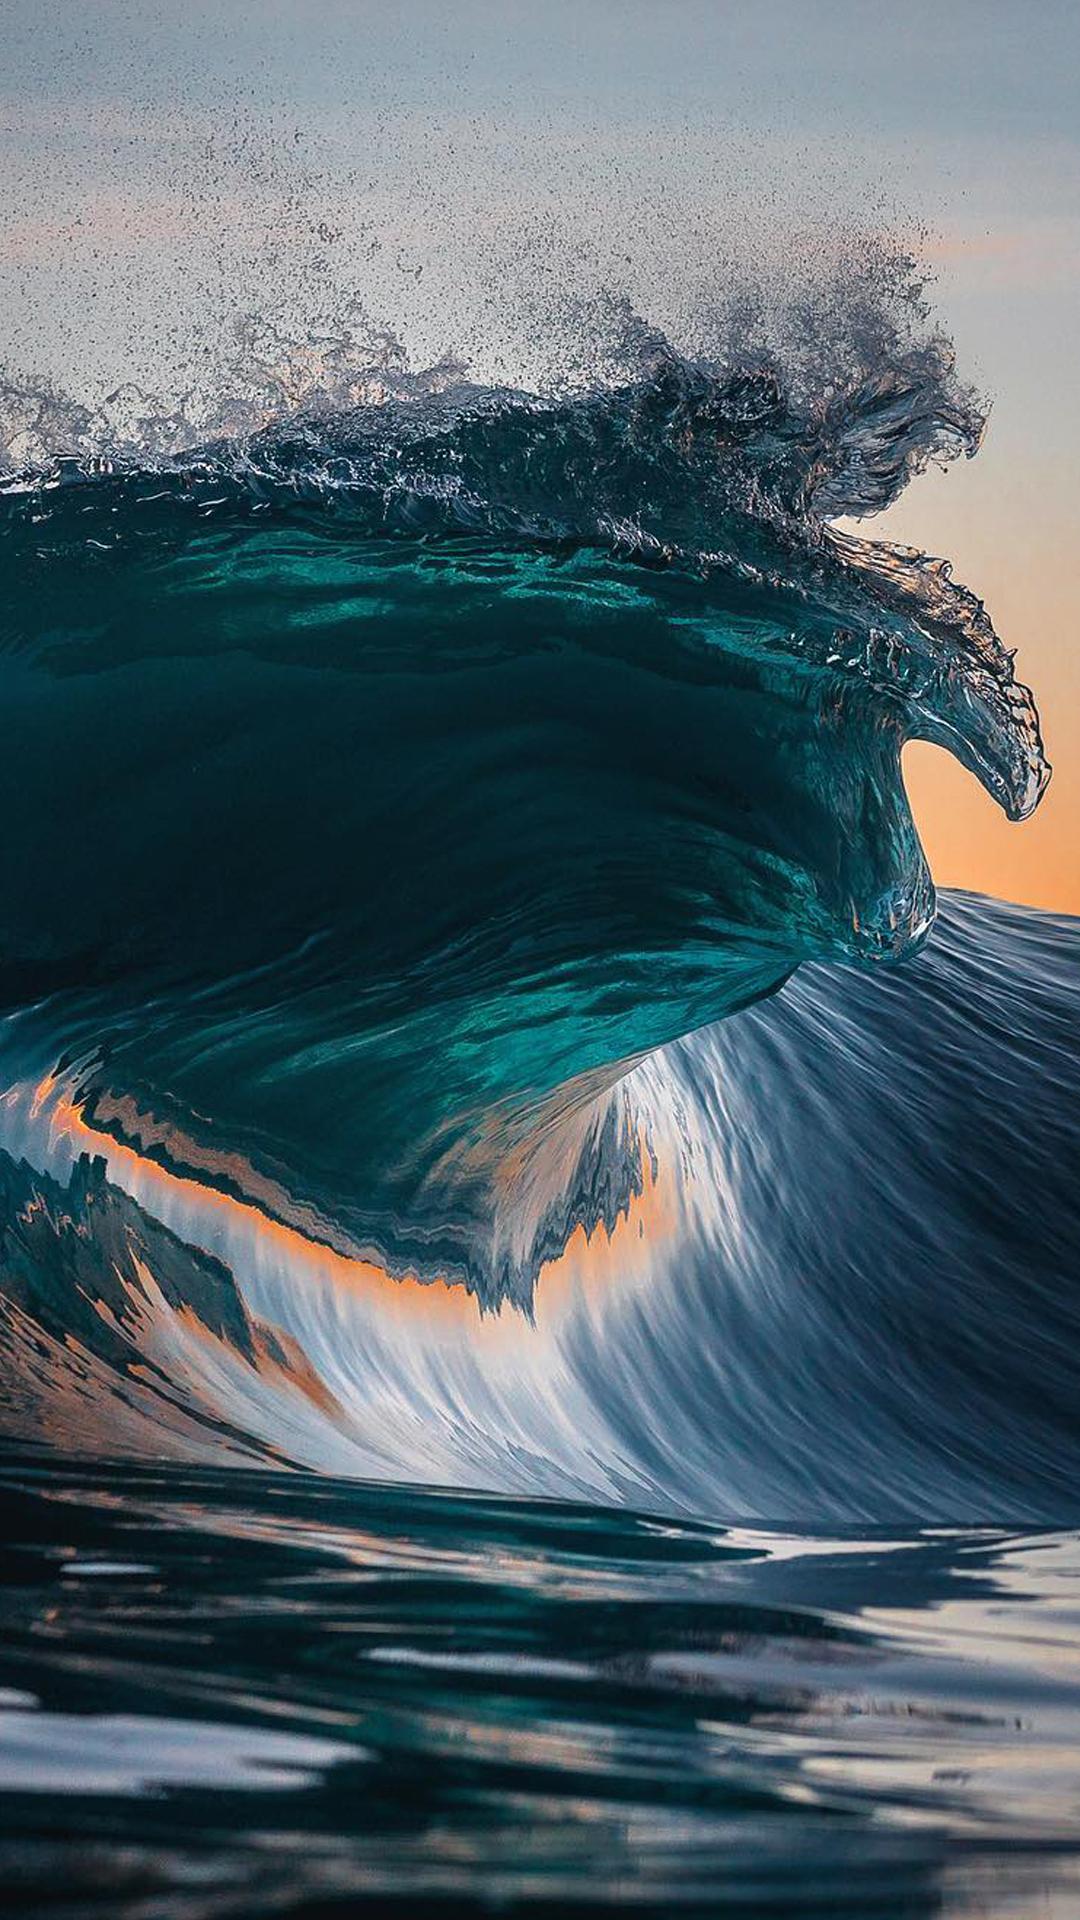 Wave Wallpaper High Resolution 4K Big Wave Wal...